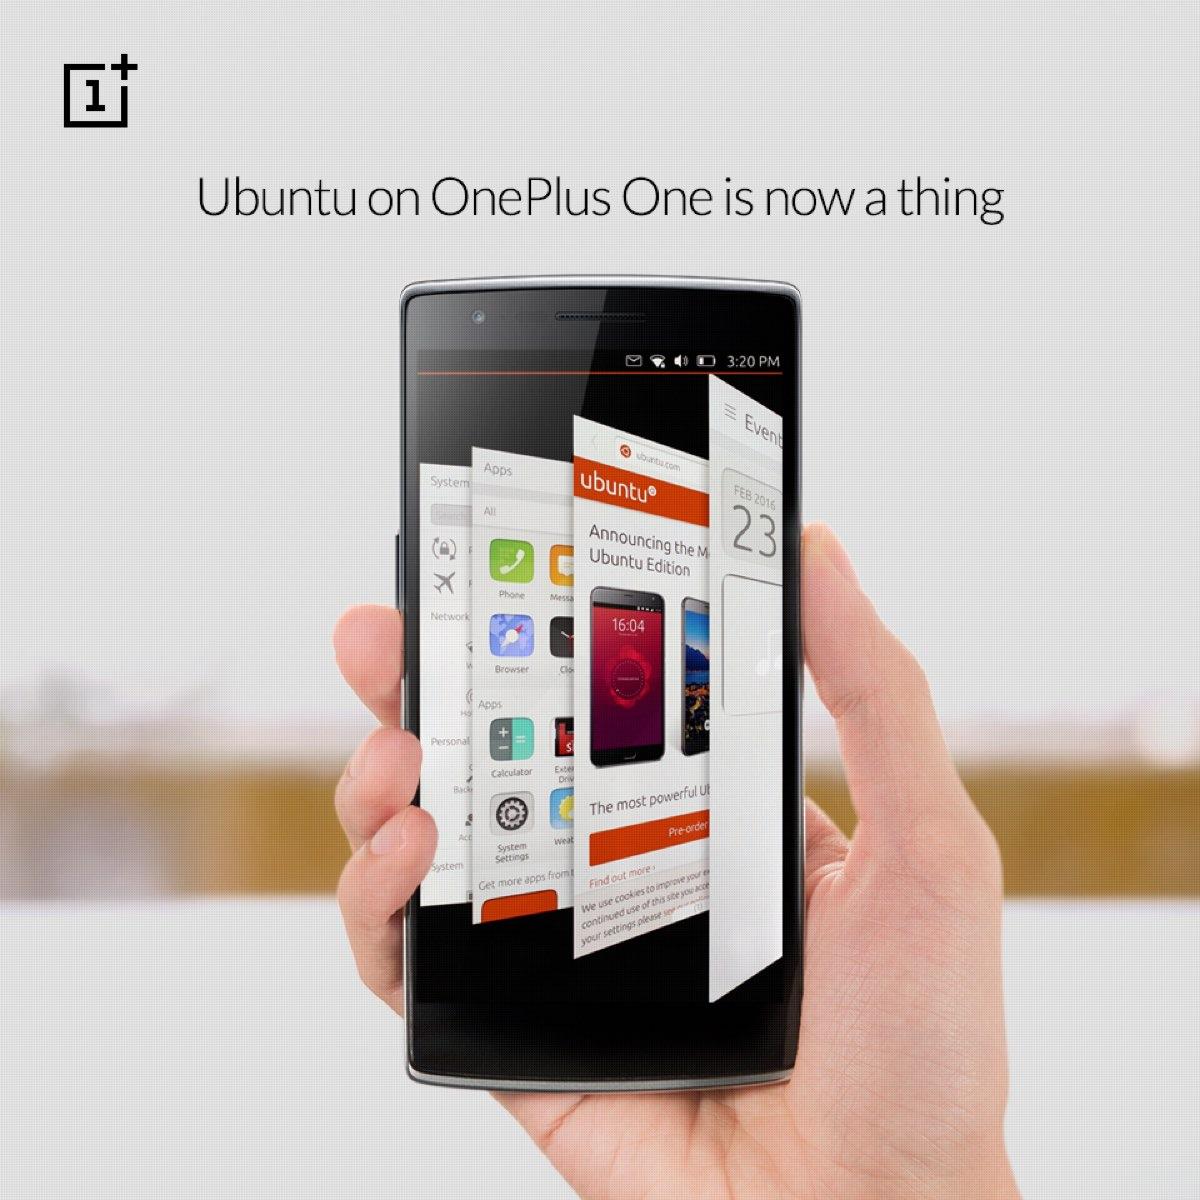 Snart kan du køre Ubuntu op din OnePlus One.